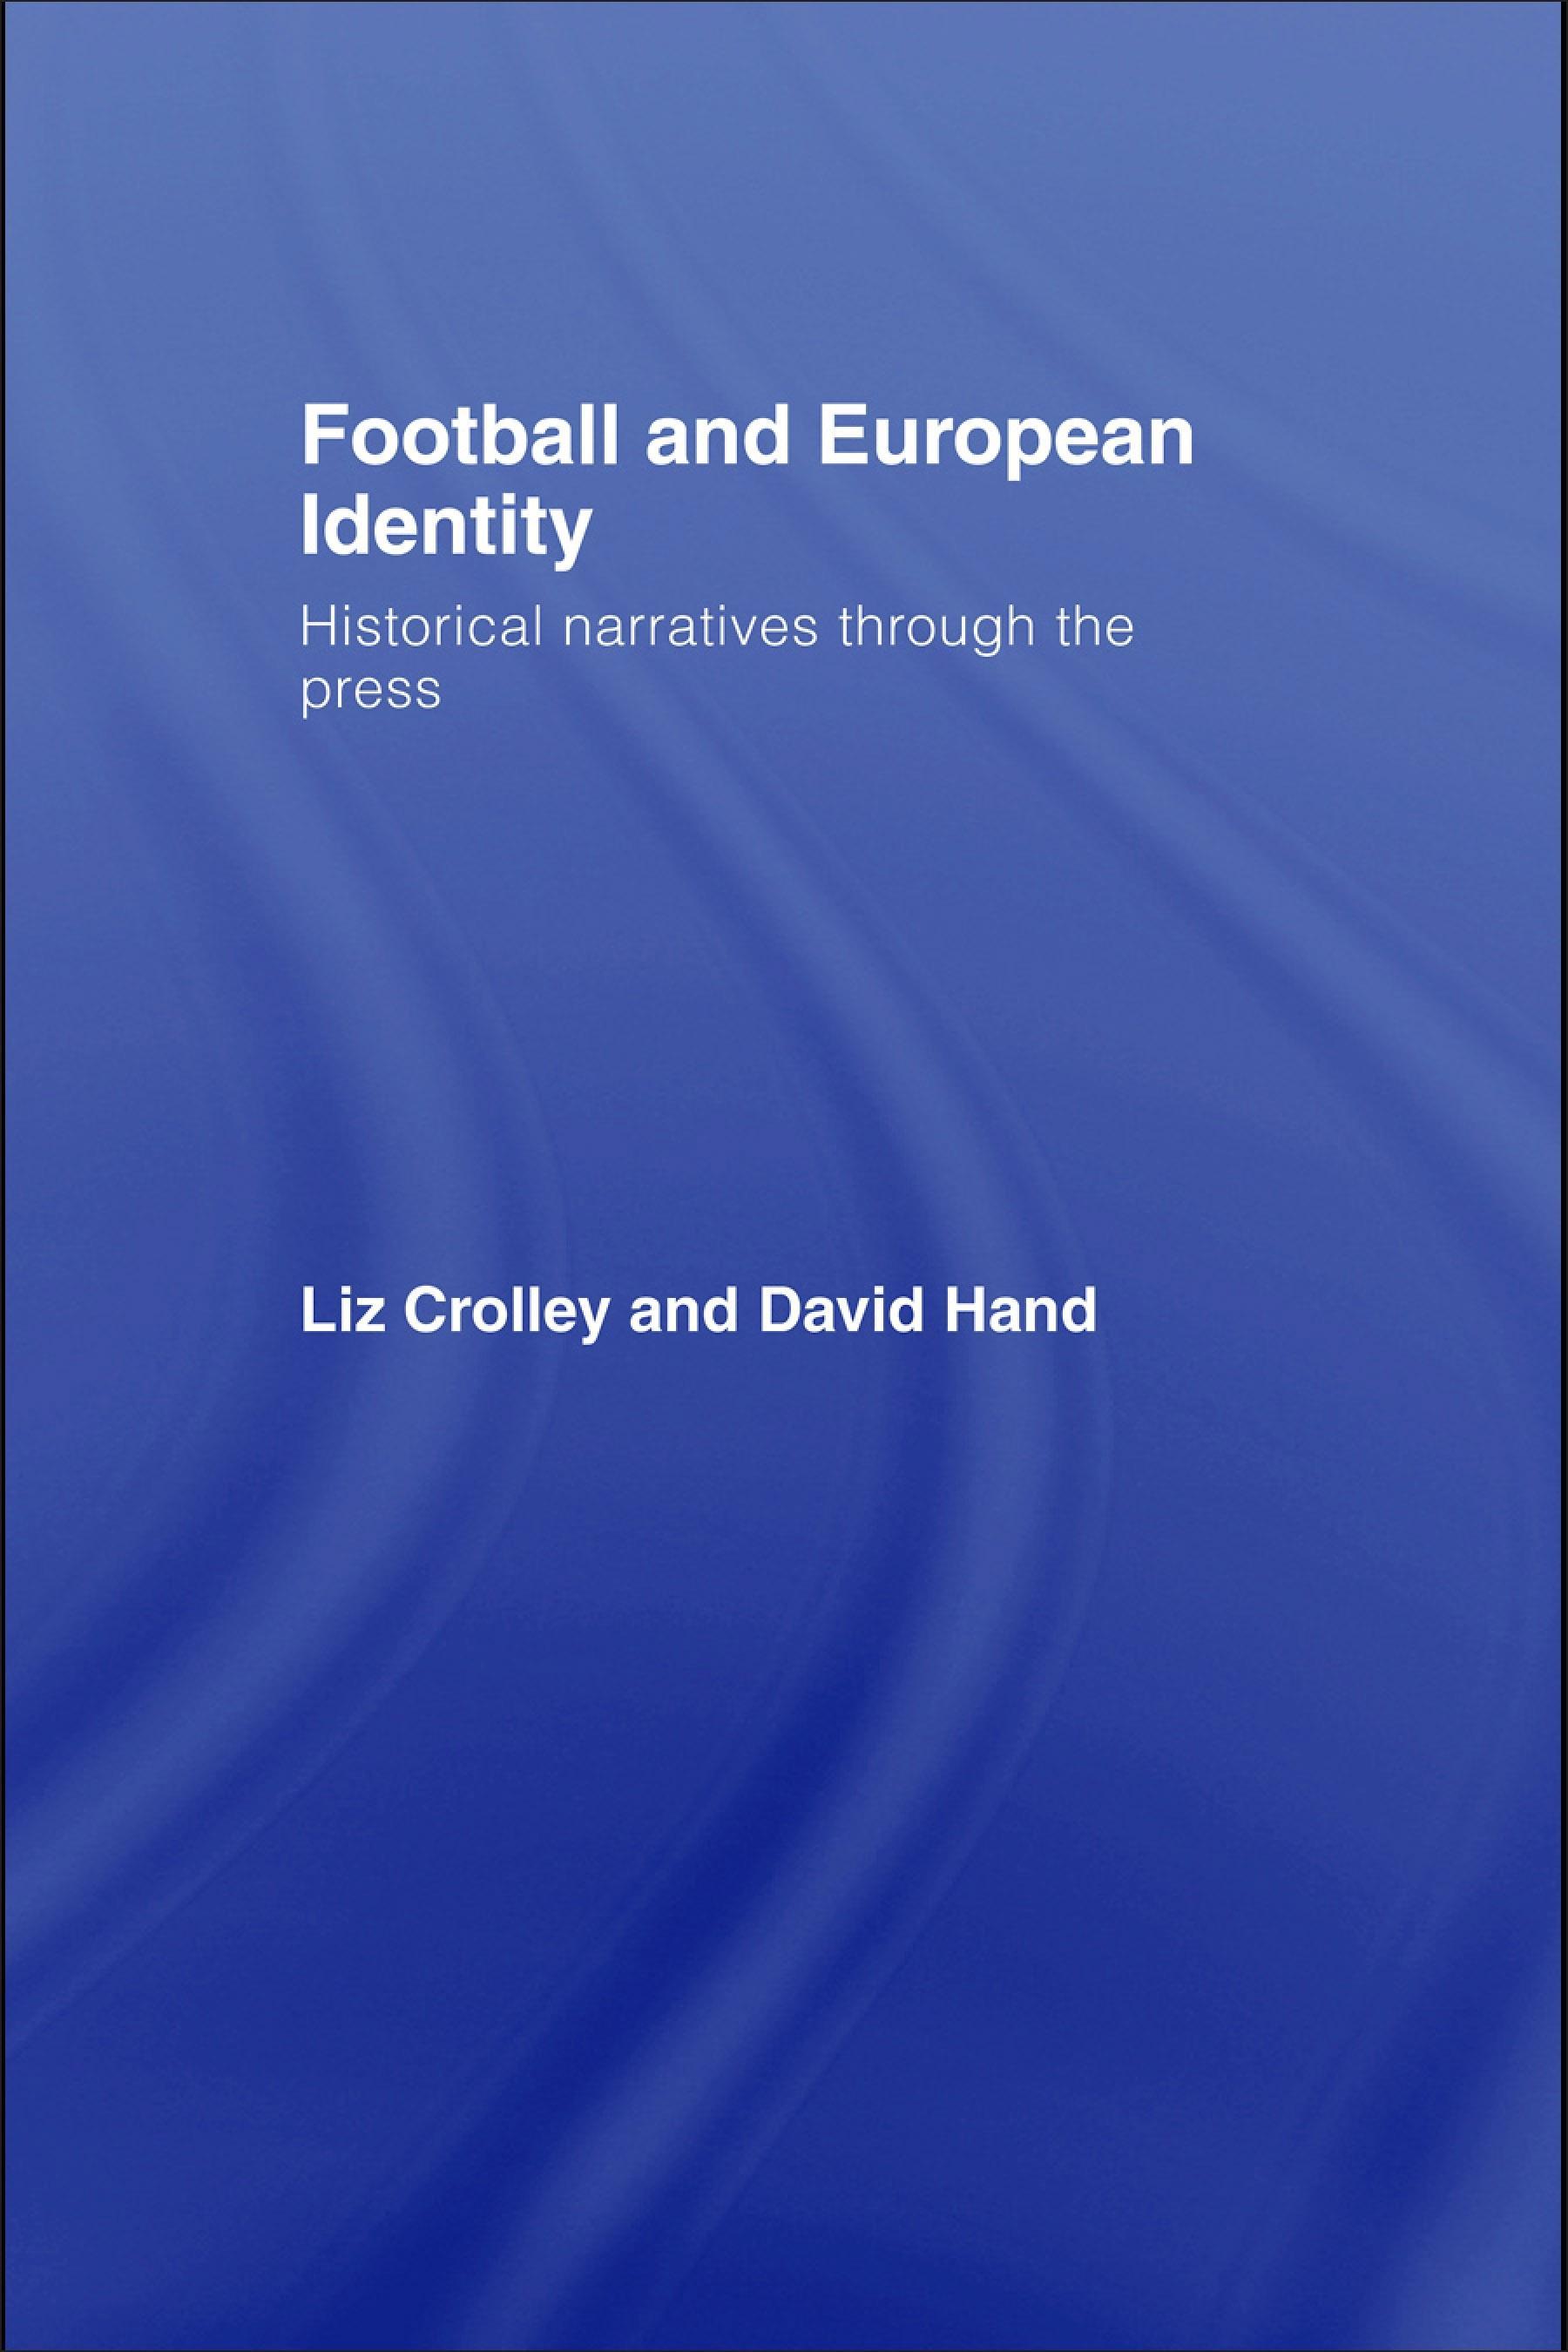 Football and European Identity: Historical Narratives Through the Press EB9780203299531